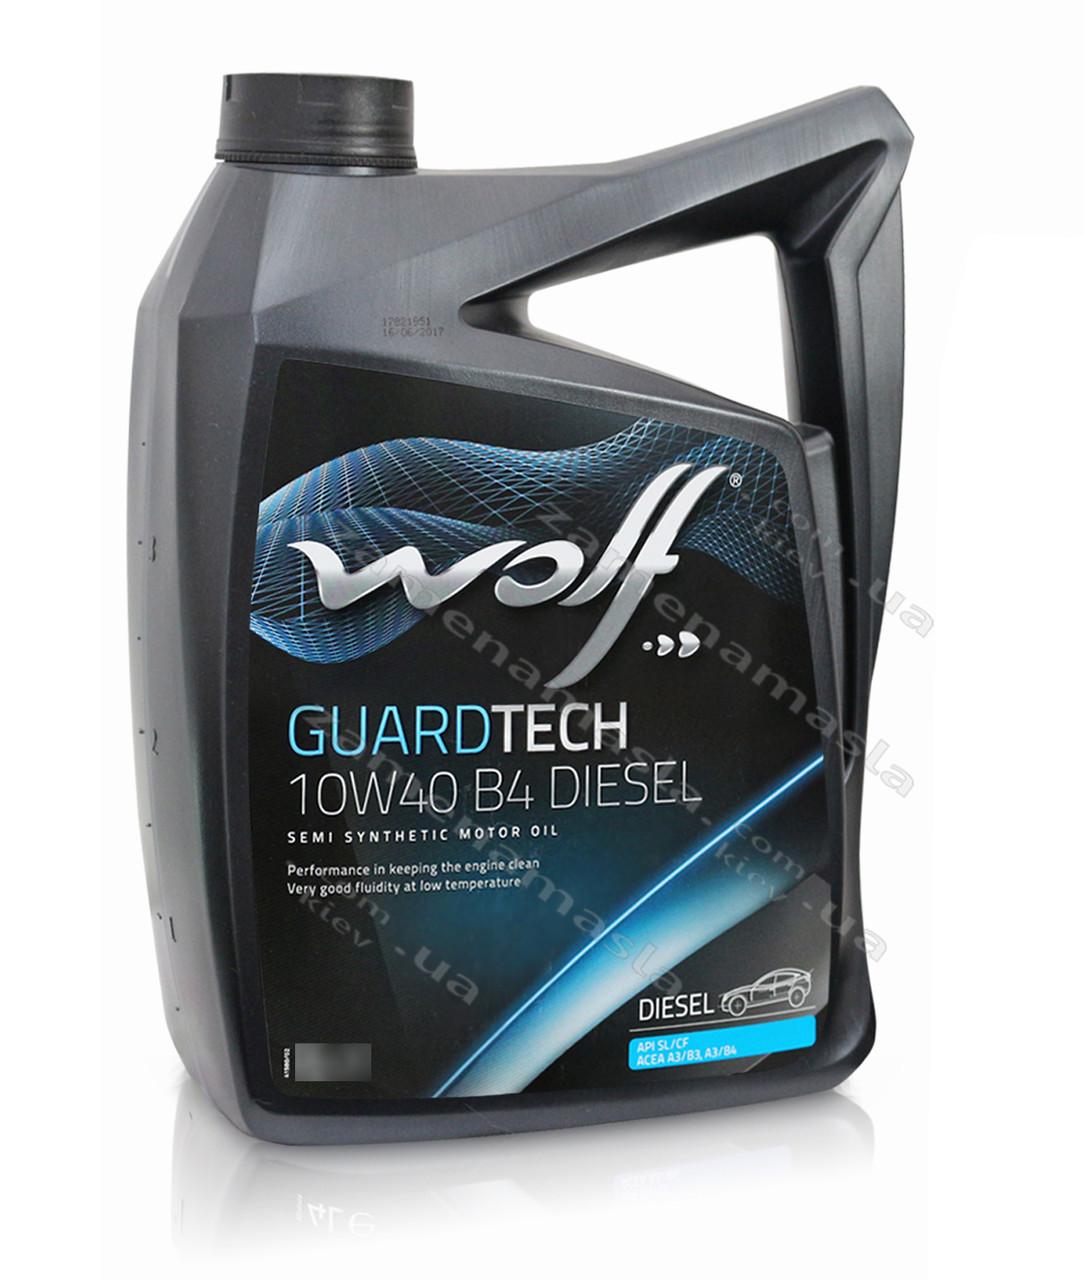 Wolf GUARDTECH 10W40 B4 DIESEL 5л - моторное масло